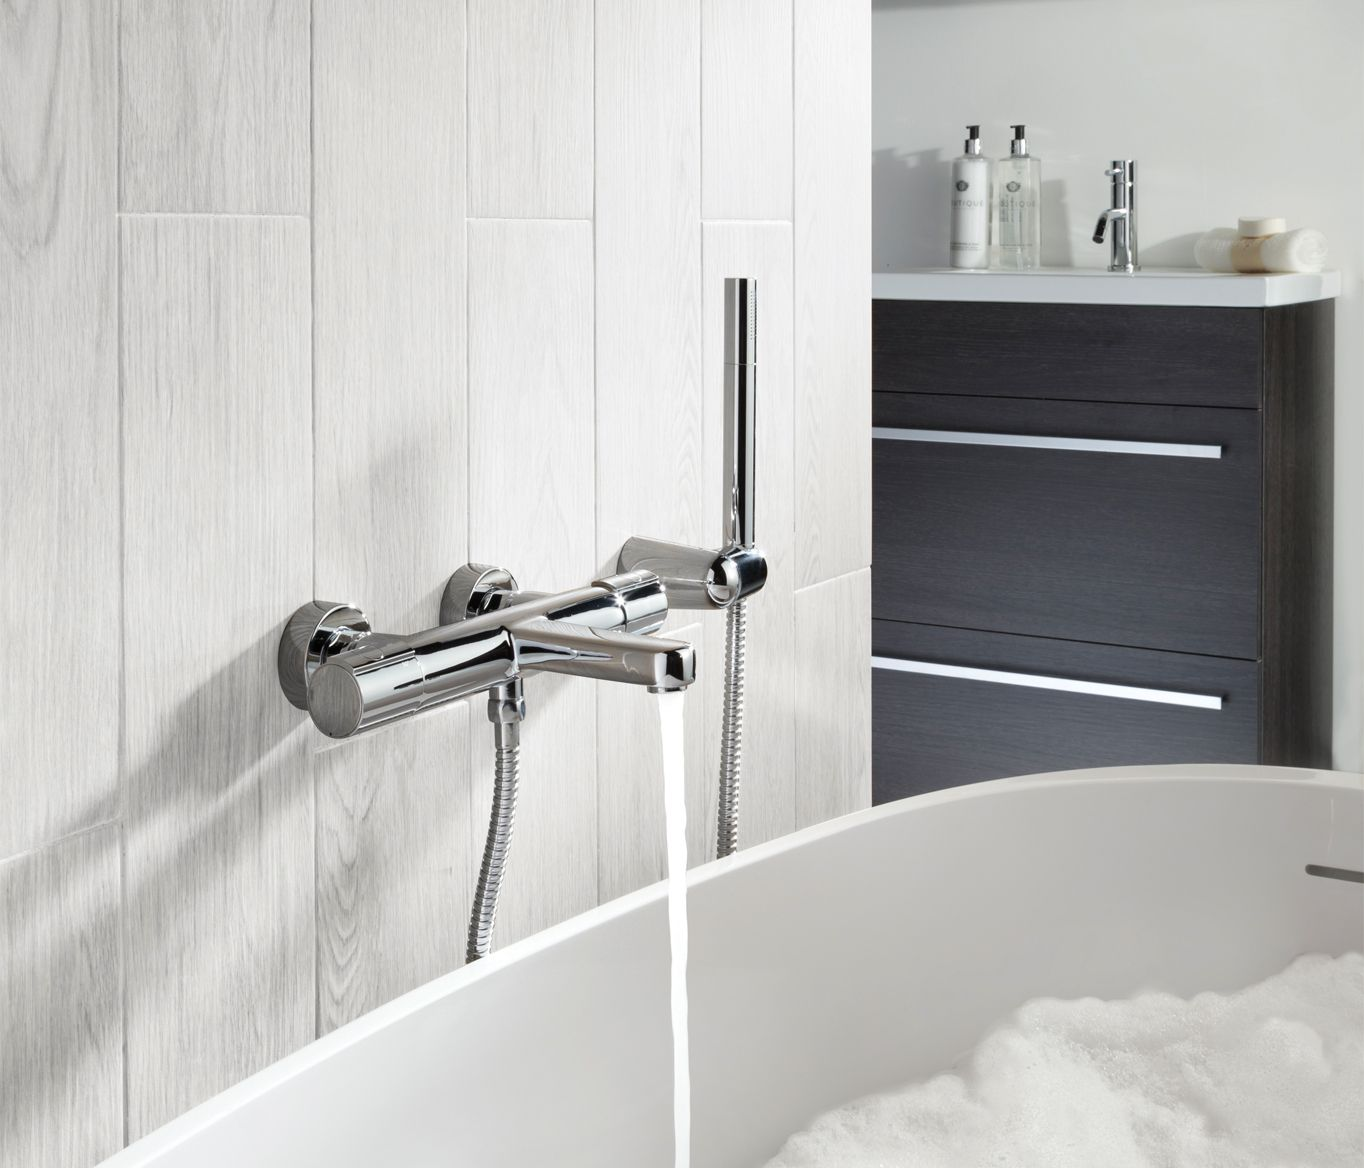 Jtp Hugo 2 Hole Wall Mounted Thermostatic Bath Shower Mixer Tap Bath Shower Mixer Taps Bath Shower Mixer Bathroom Taps